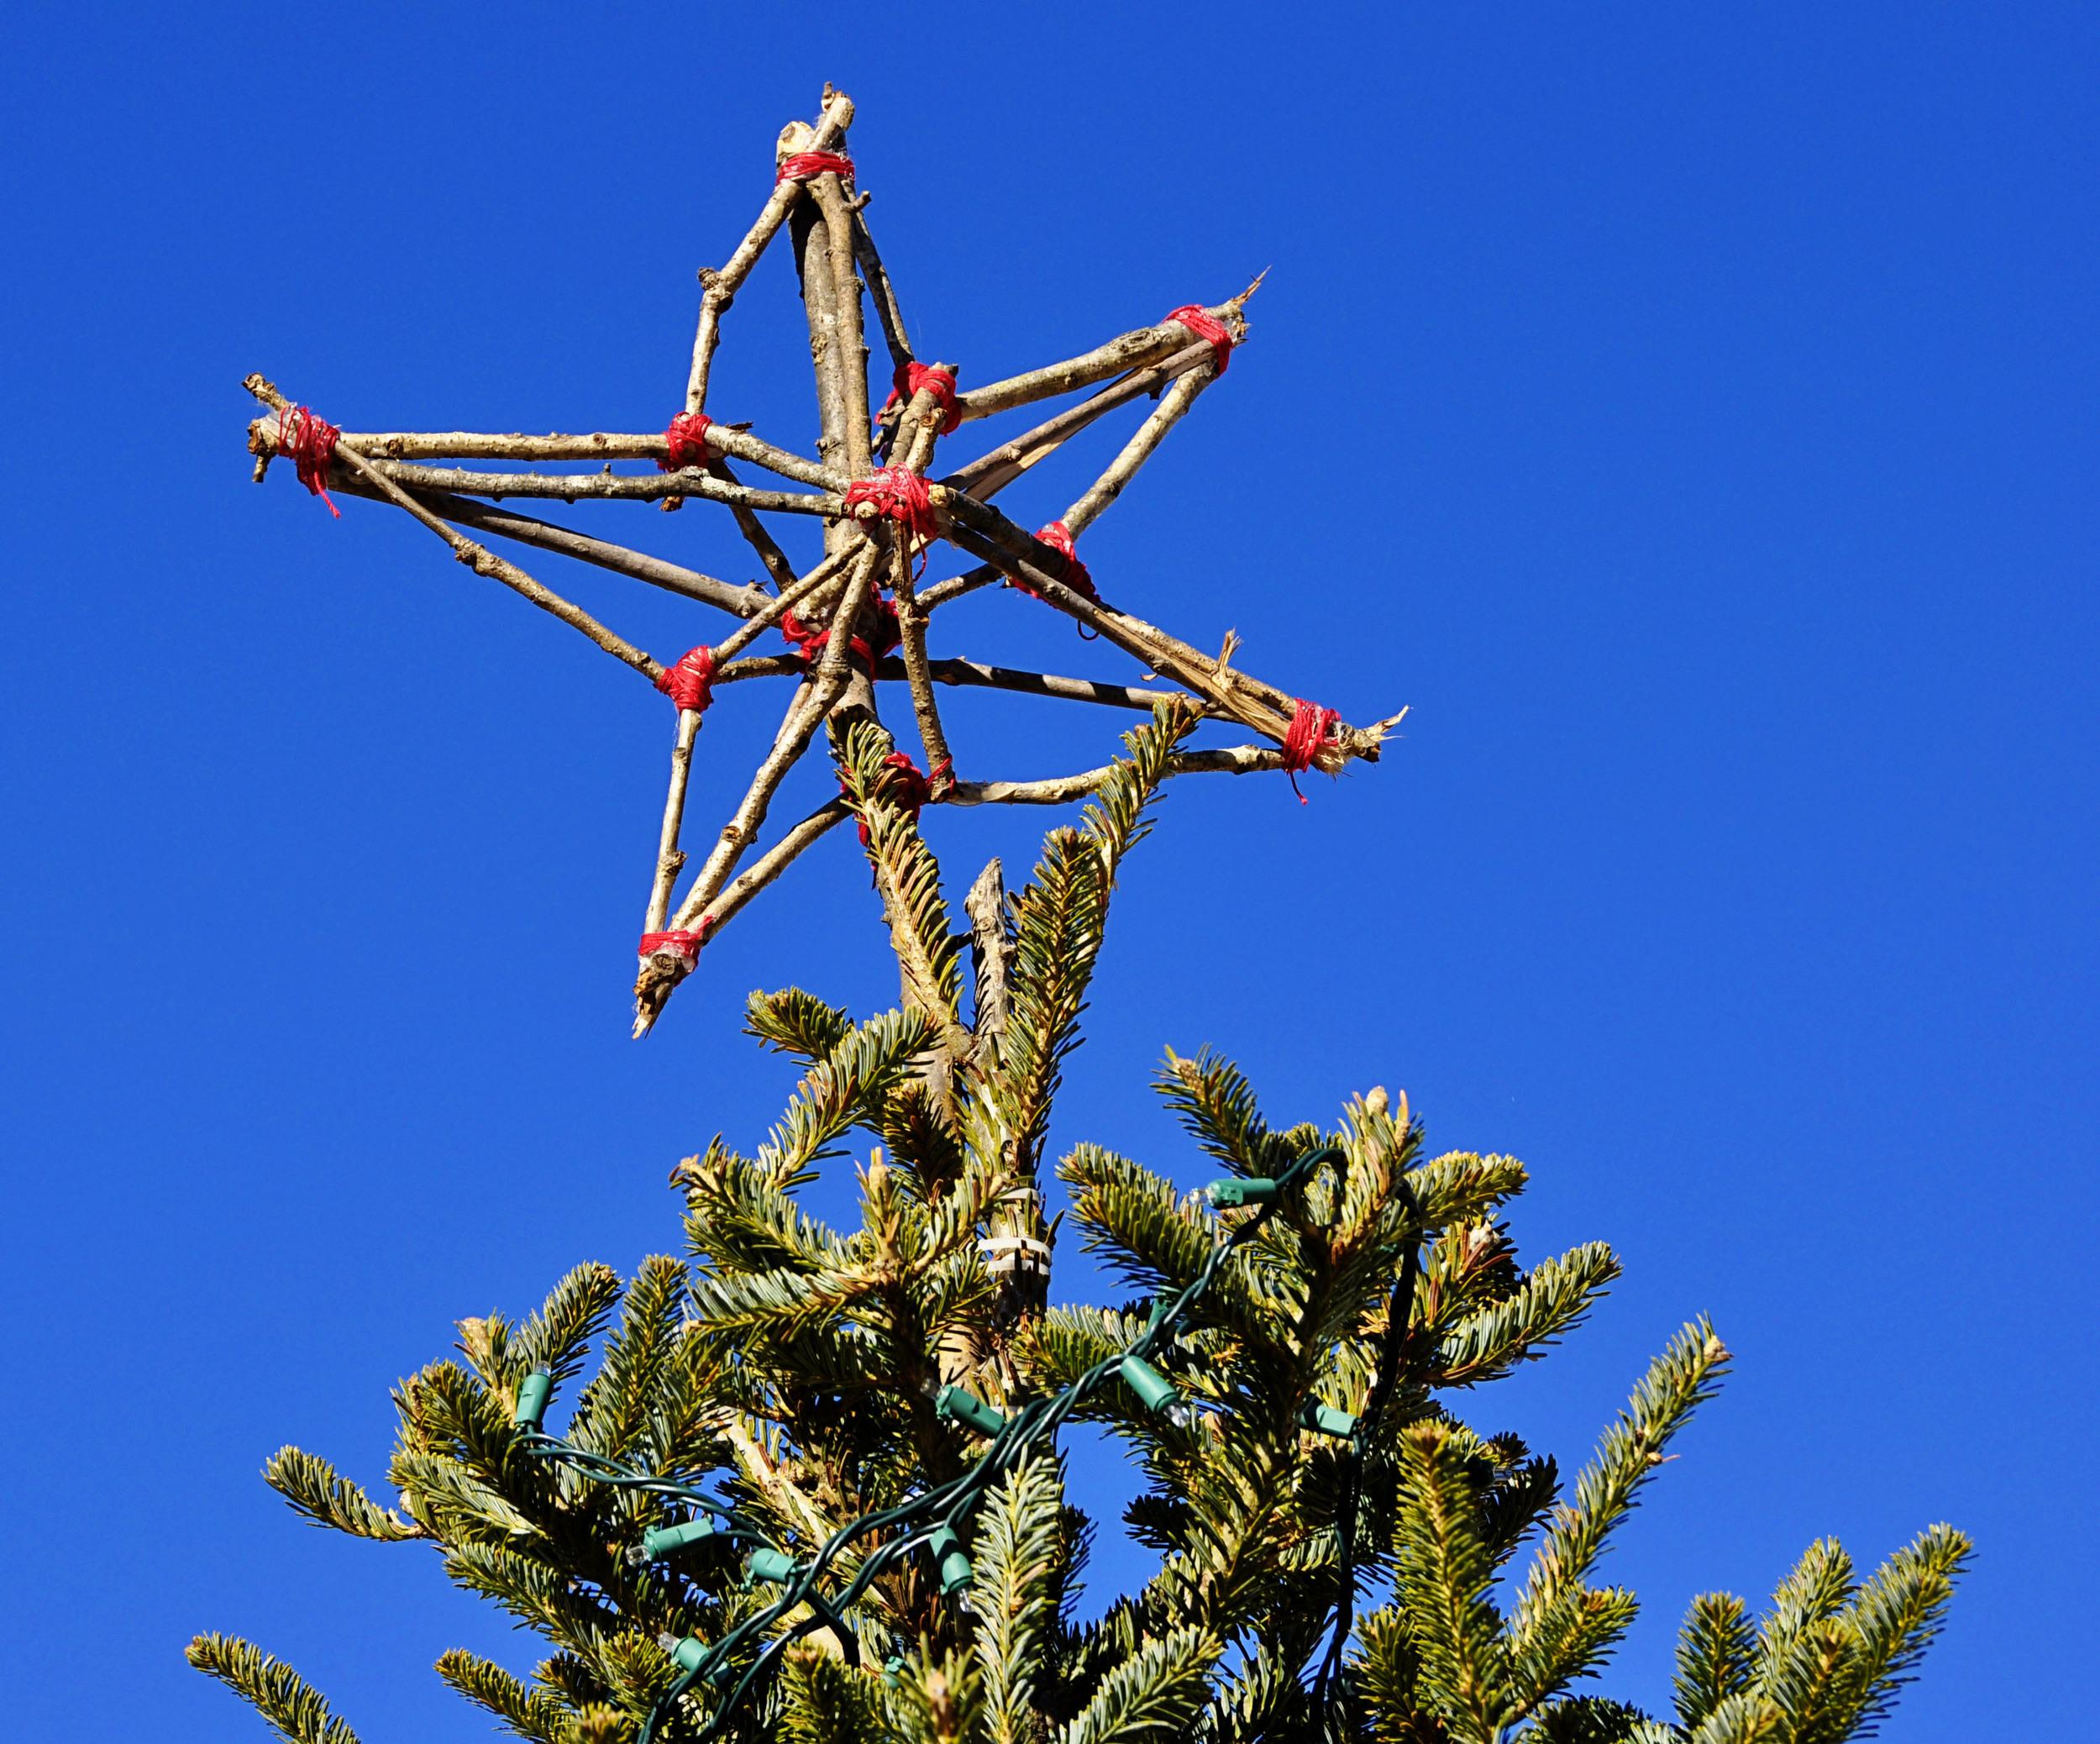 Treetop4.jpg